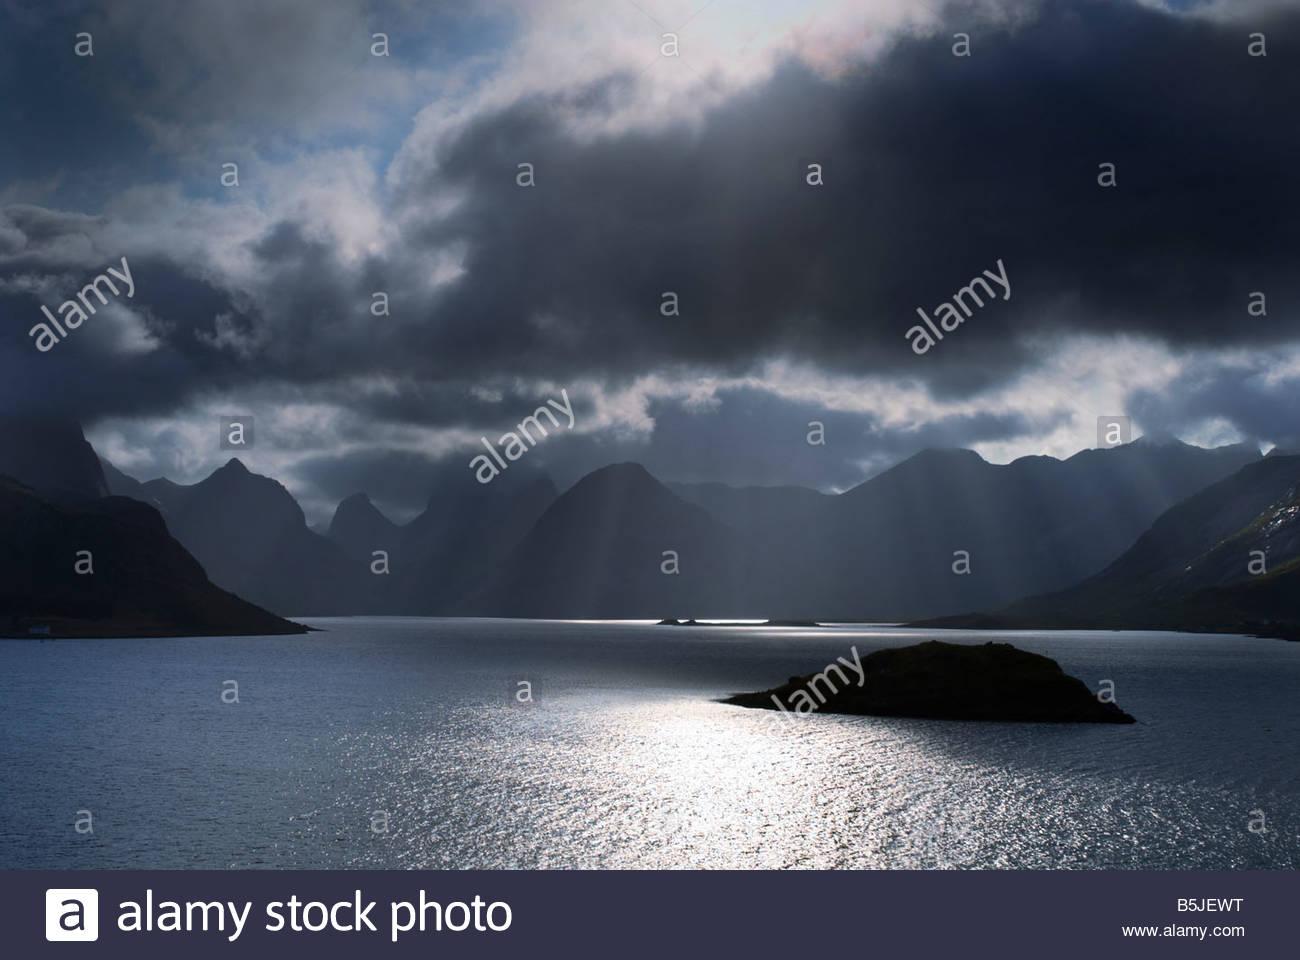 Stormy skies, Lofoten Islands, Norway. - Stock Image